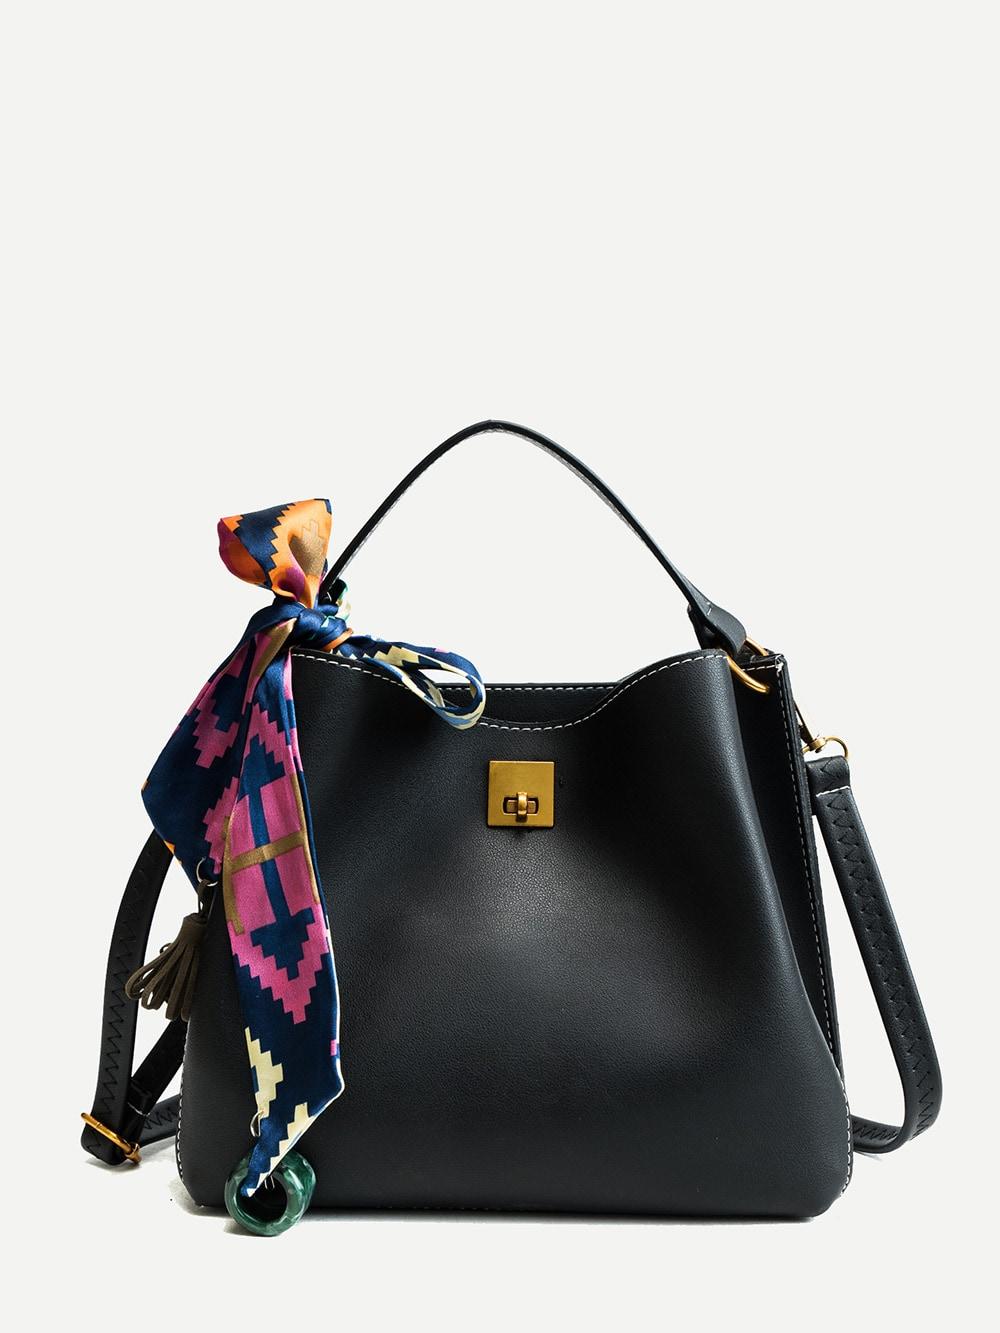 Фото - Кожаная сумка через плечо с бахромой от SheIn черного цвета